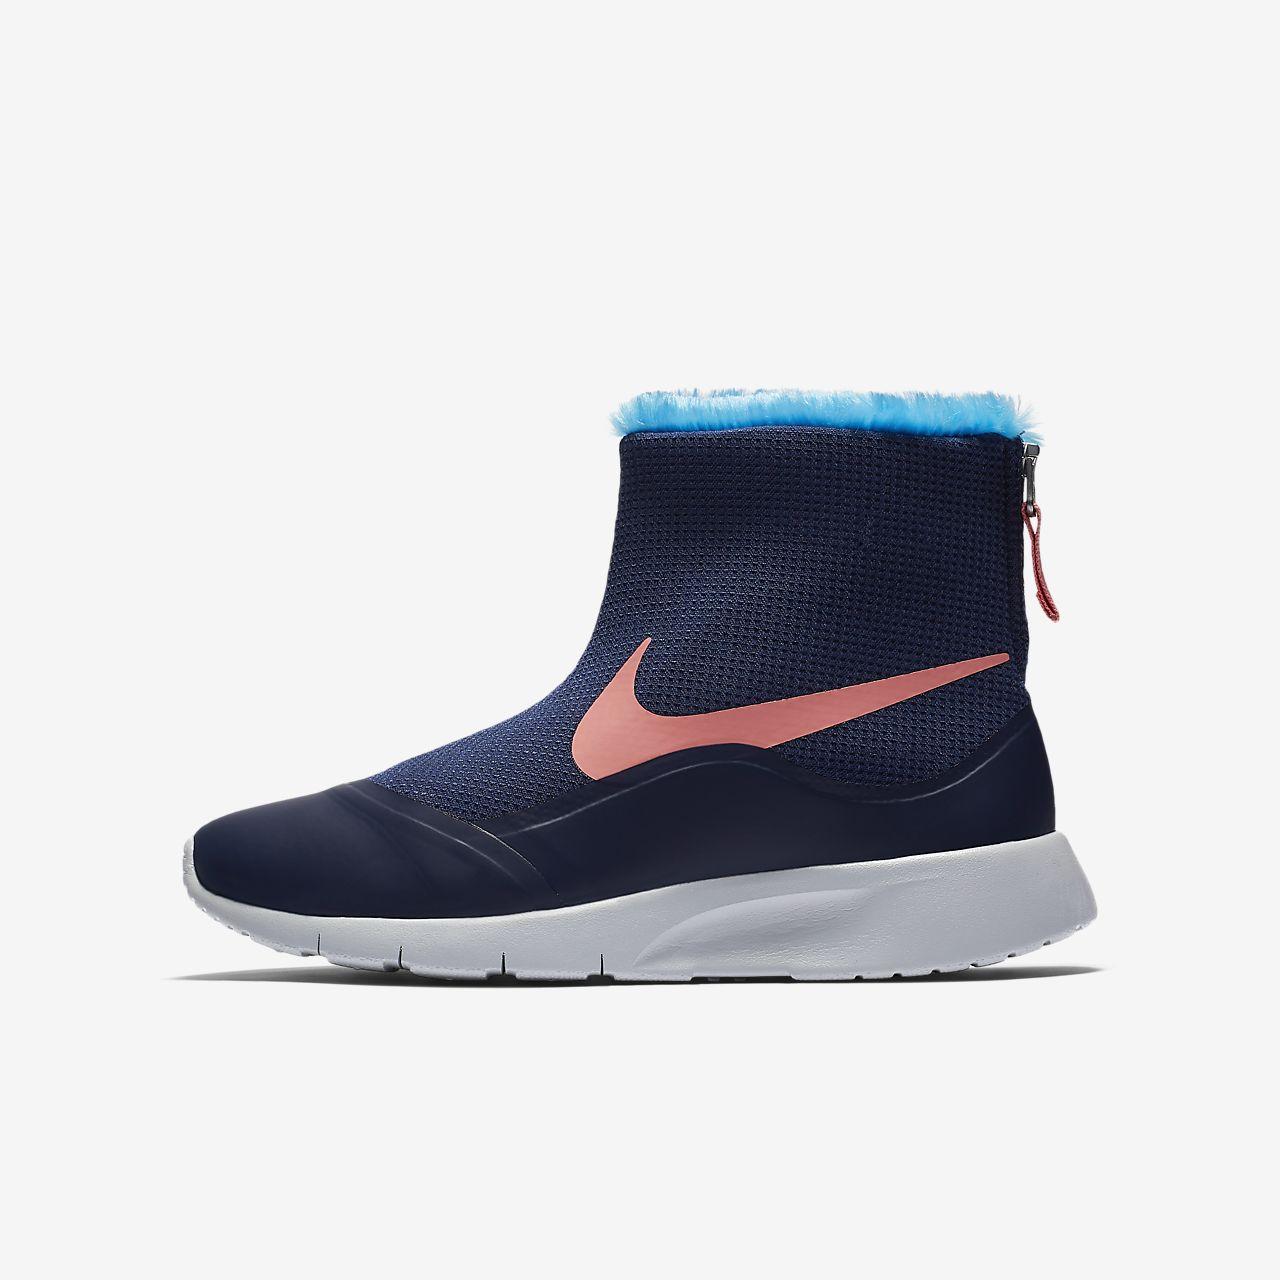 Nike TanjunHI (GS)大童运动童鞋